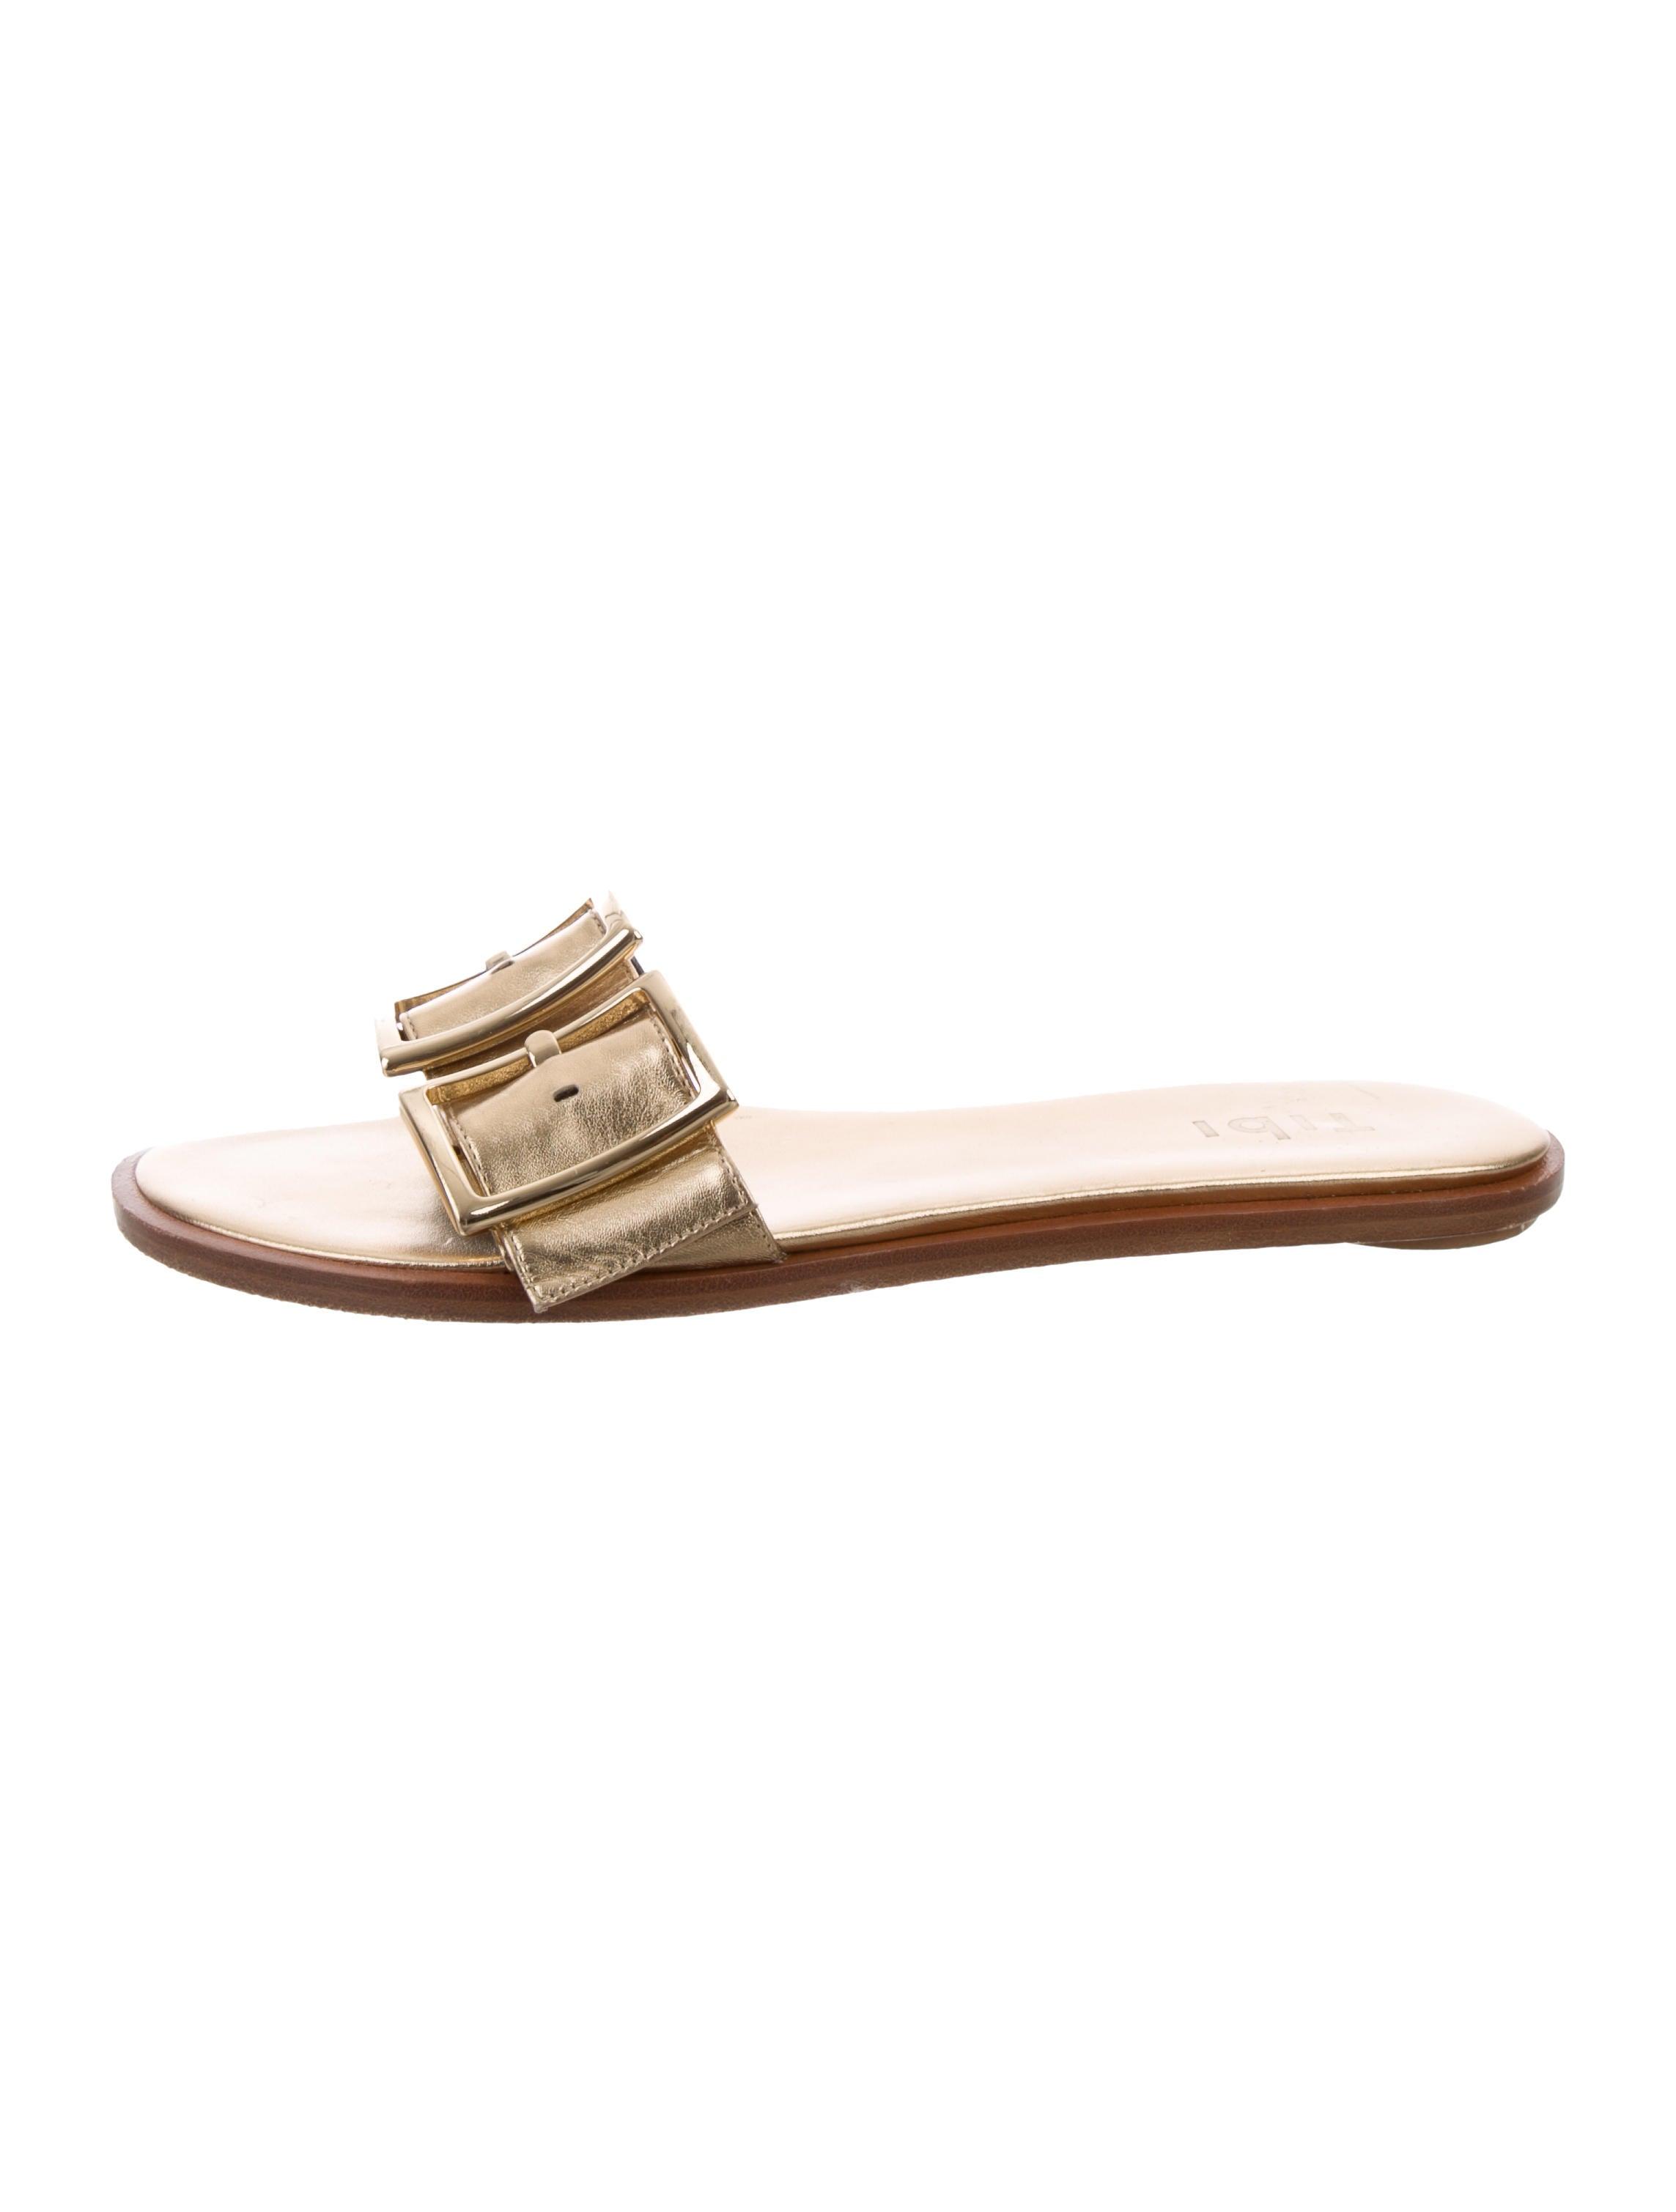 discount official brand new unisex cheap online Tibi Metallic Slide Sandals h3pRC